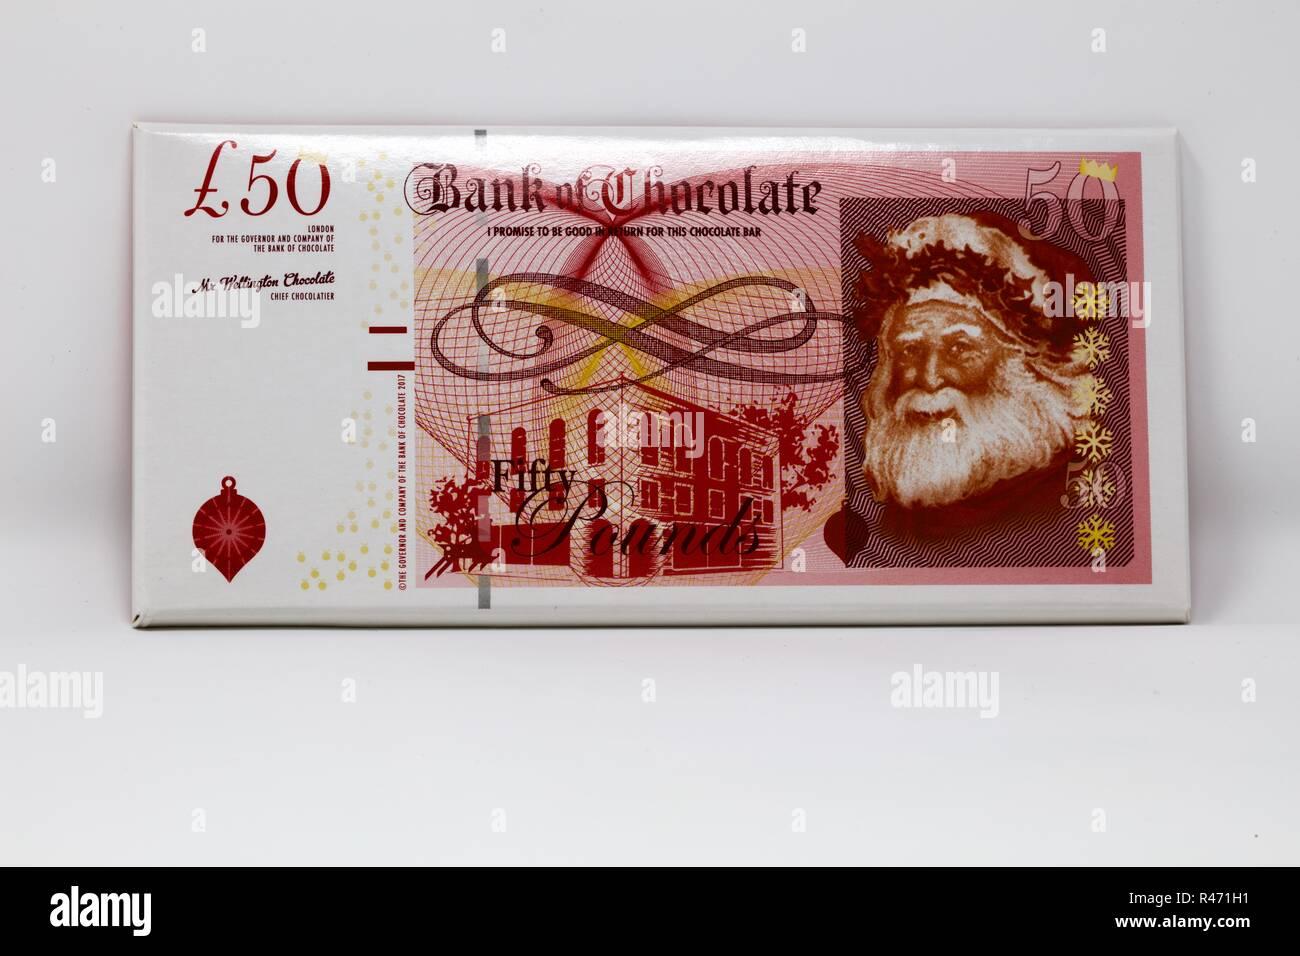 Fifty pound Bank of England Chocolate Bar - Stock Image